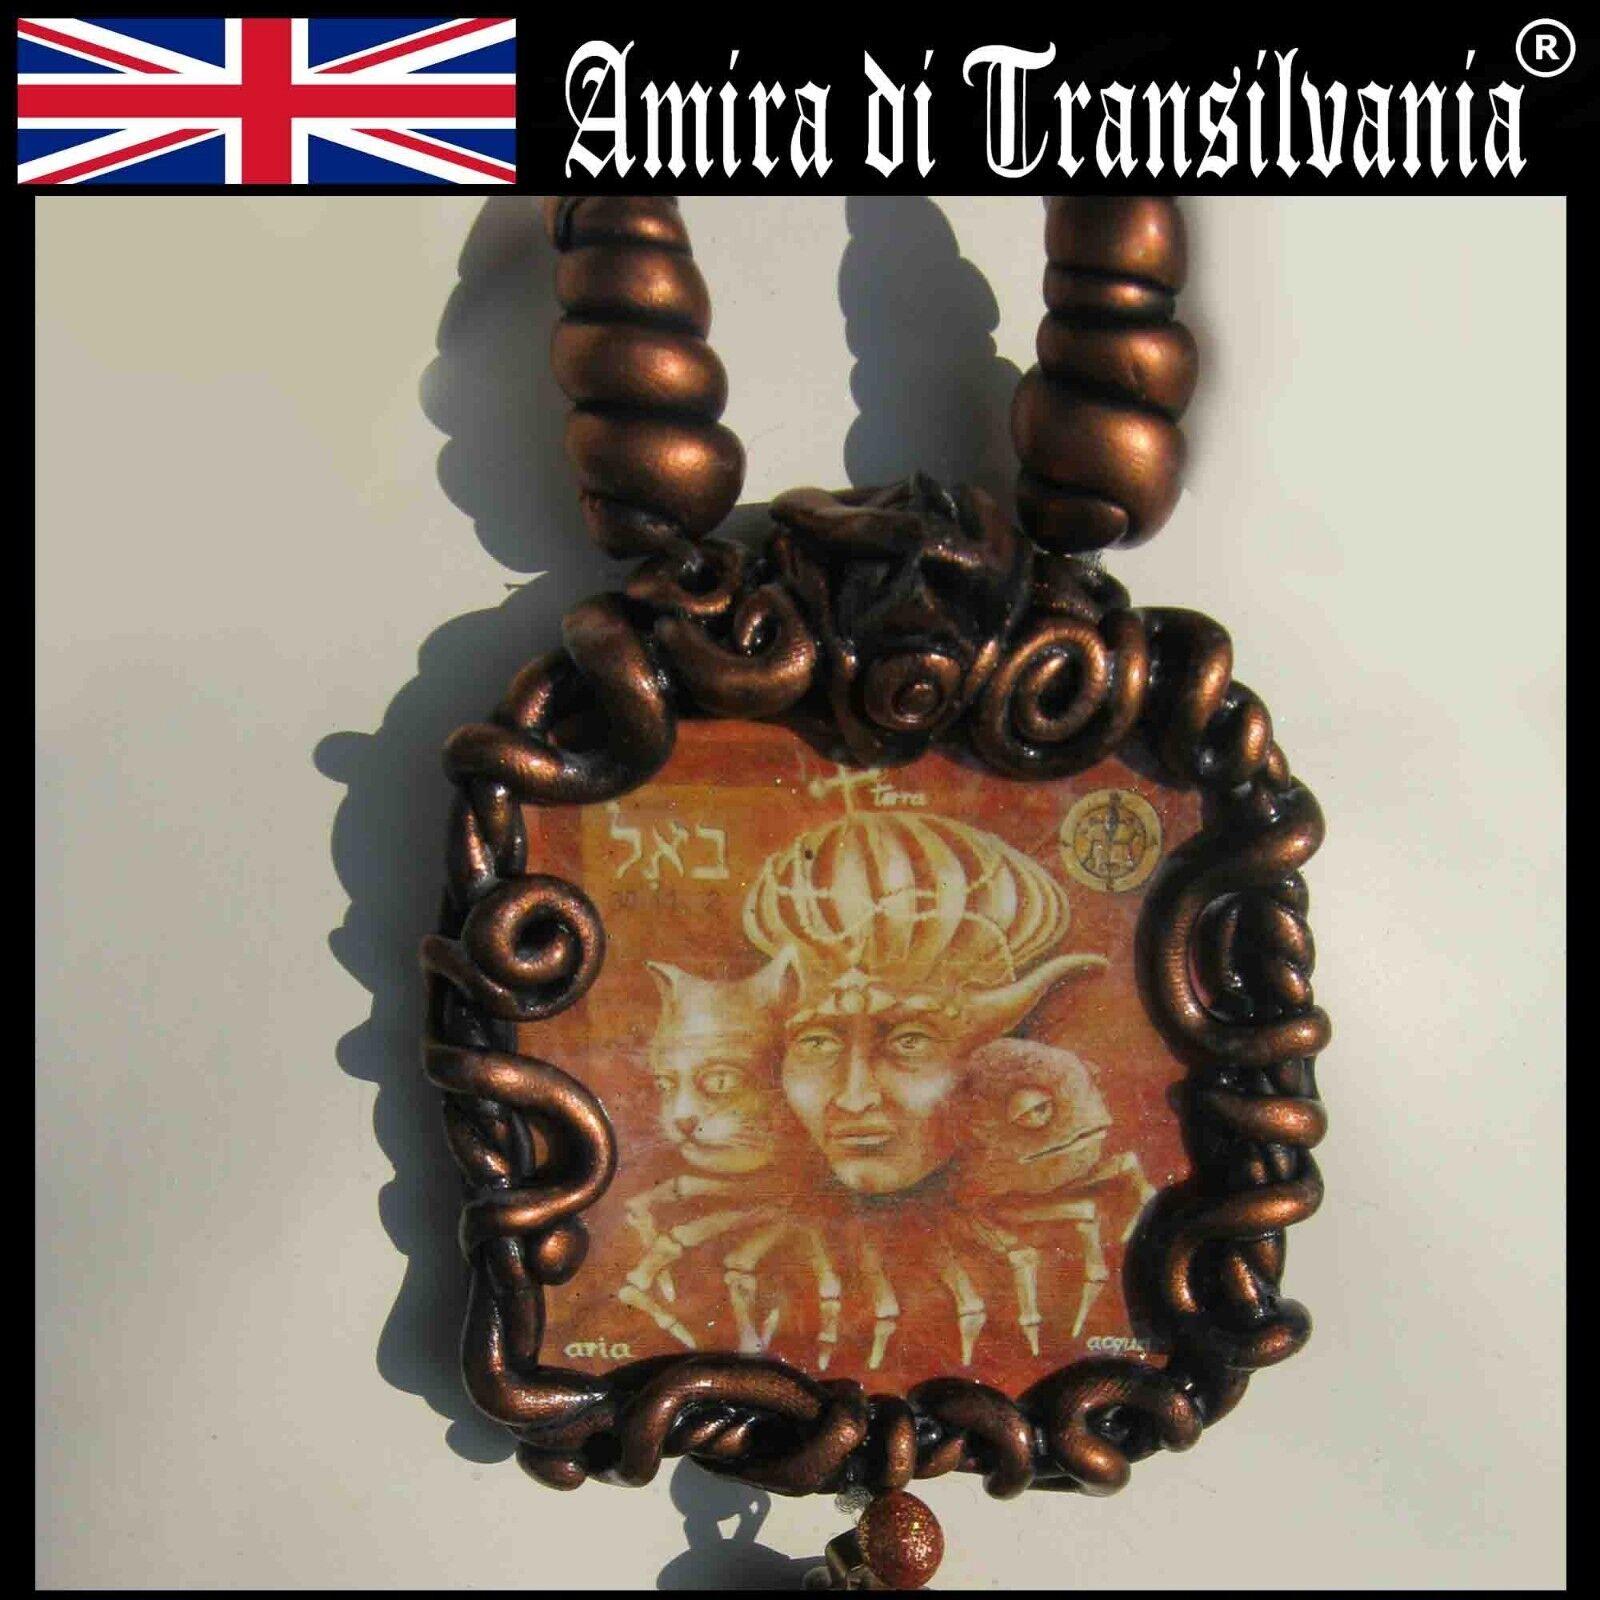 Bael demon Goetia Lemegeton paganism occult old amulets talisman effective power